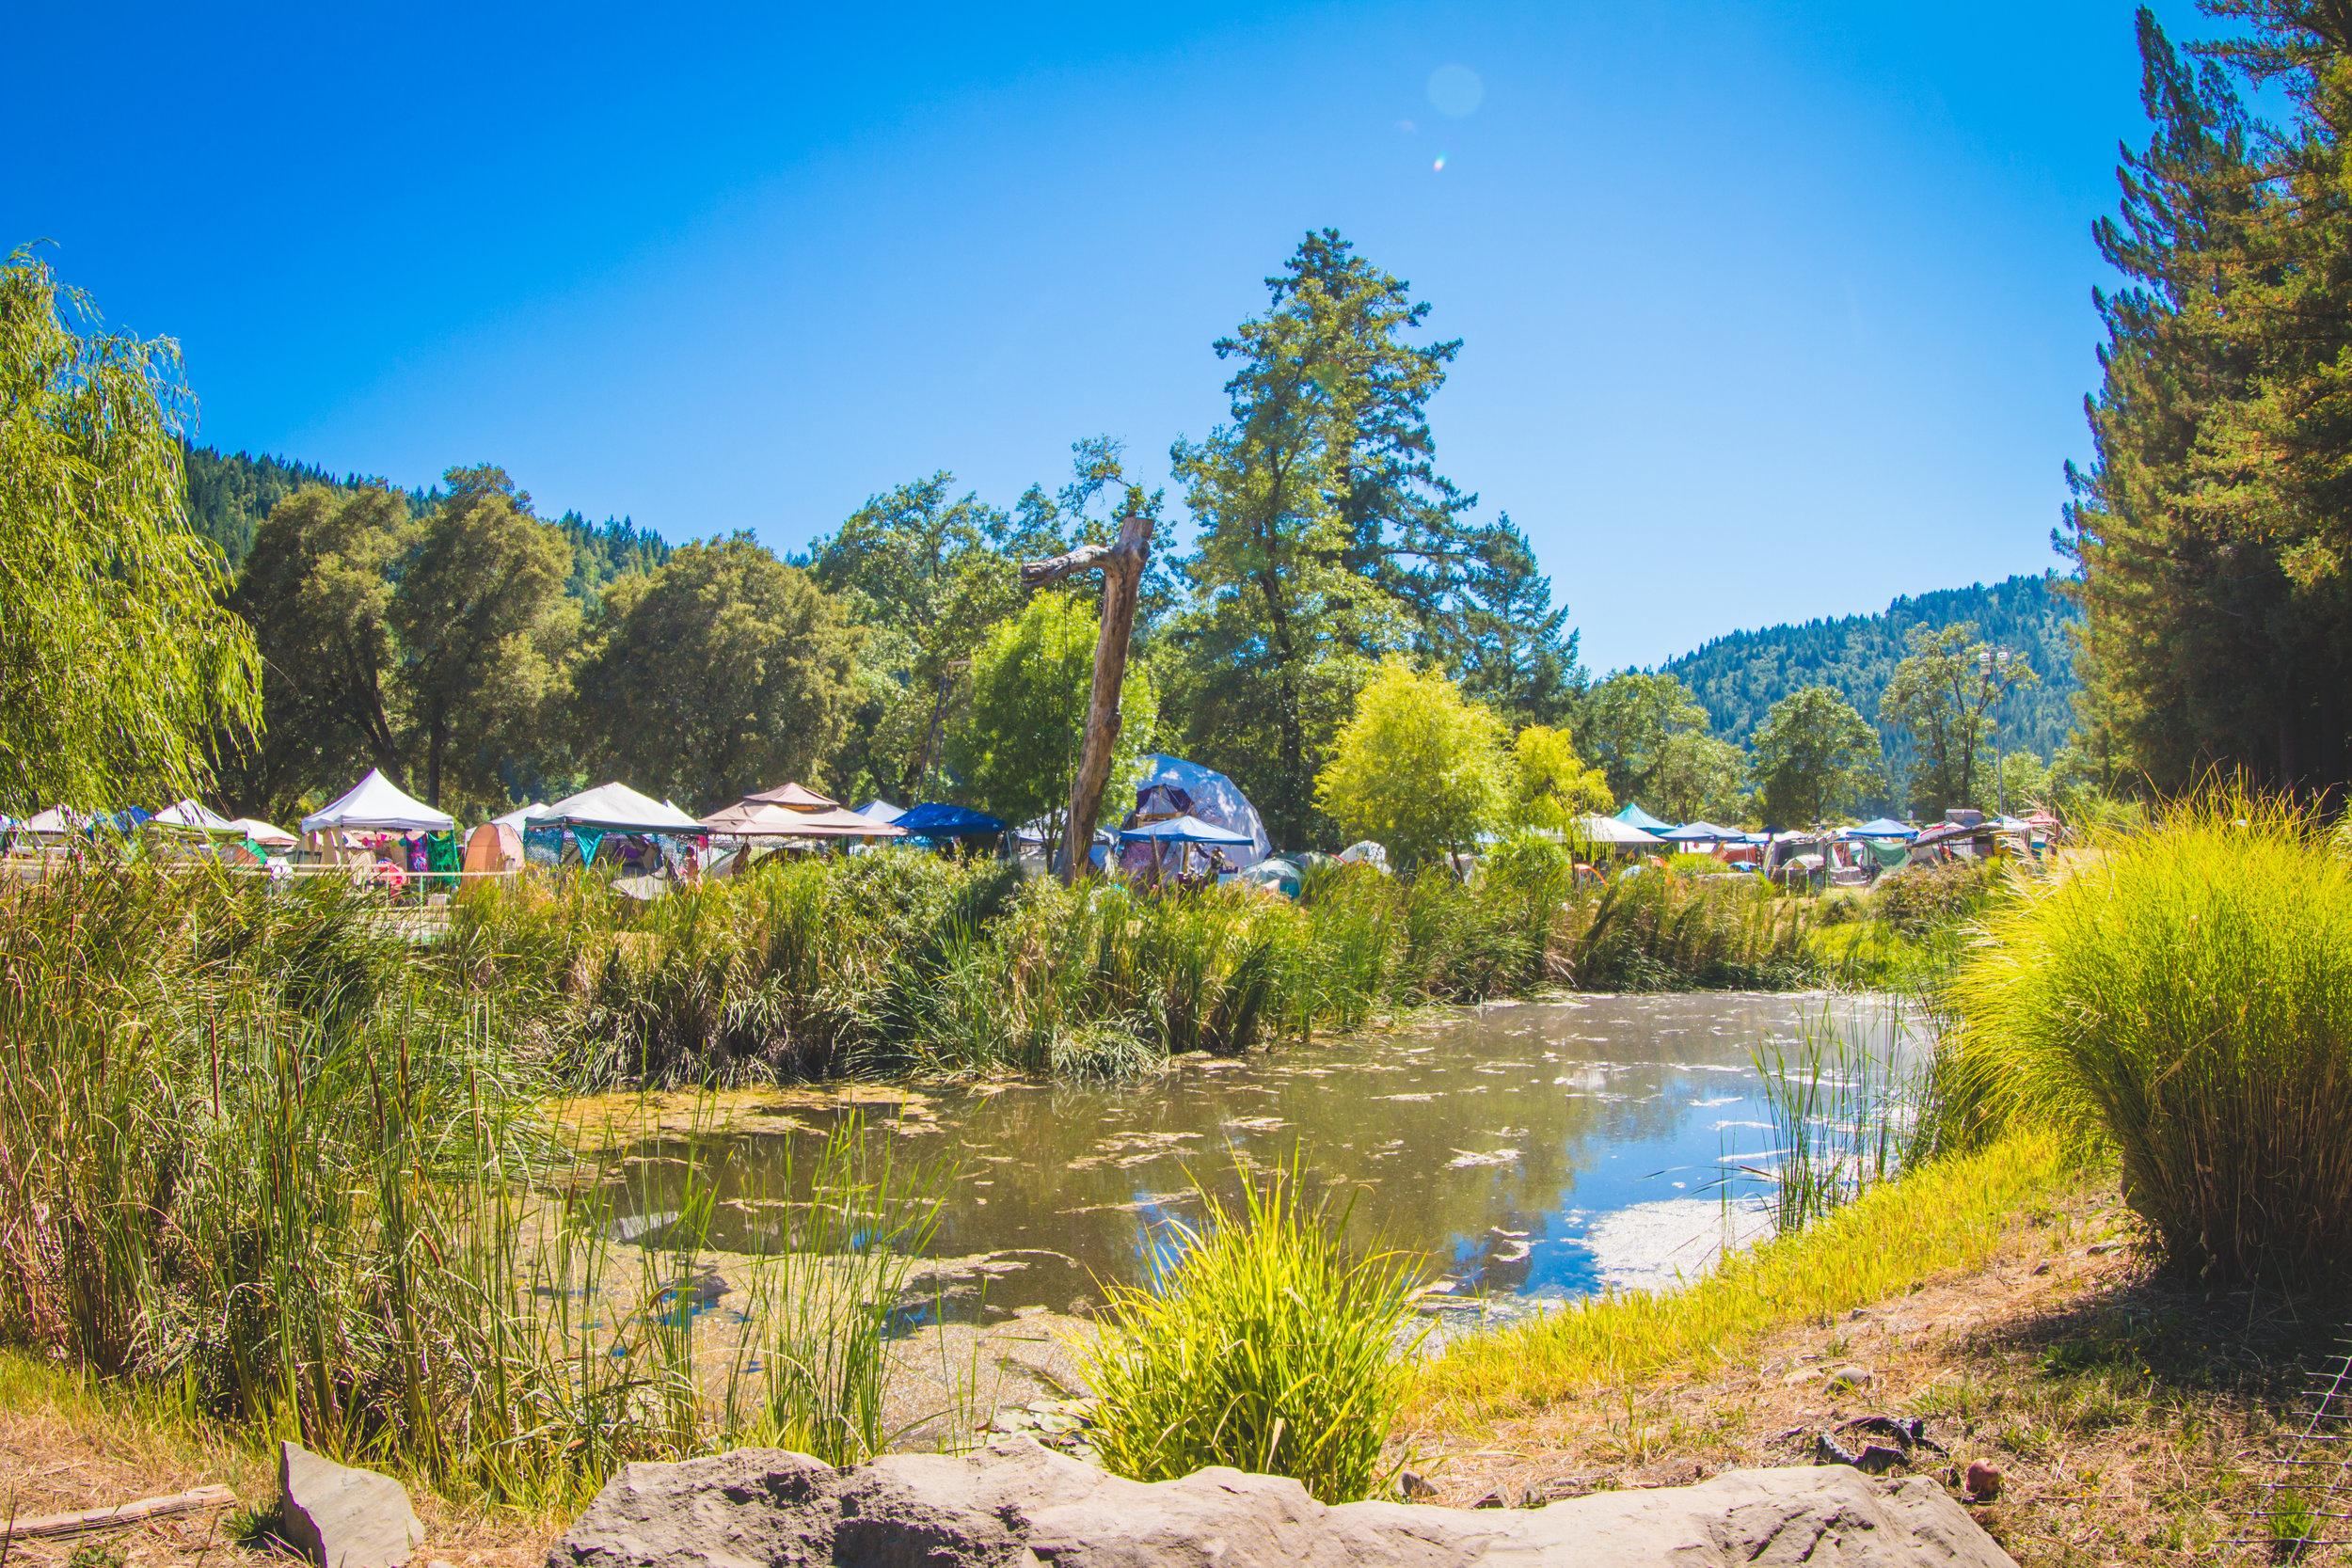 meadow-camping-festival.jpg